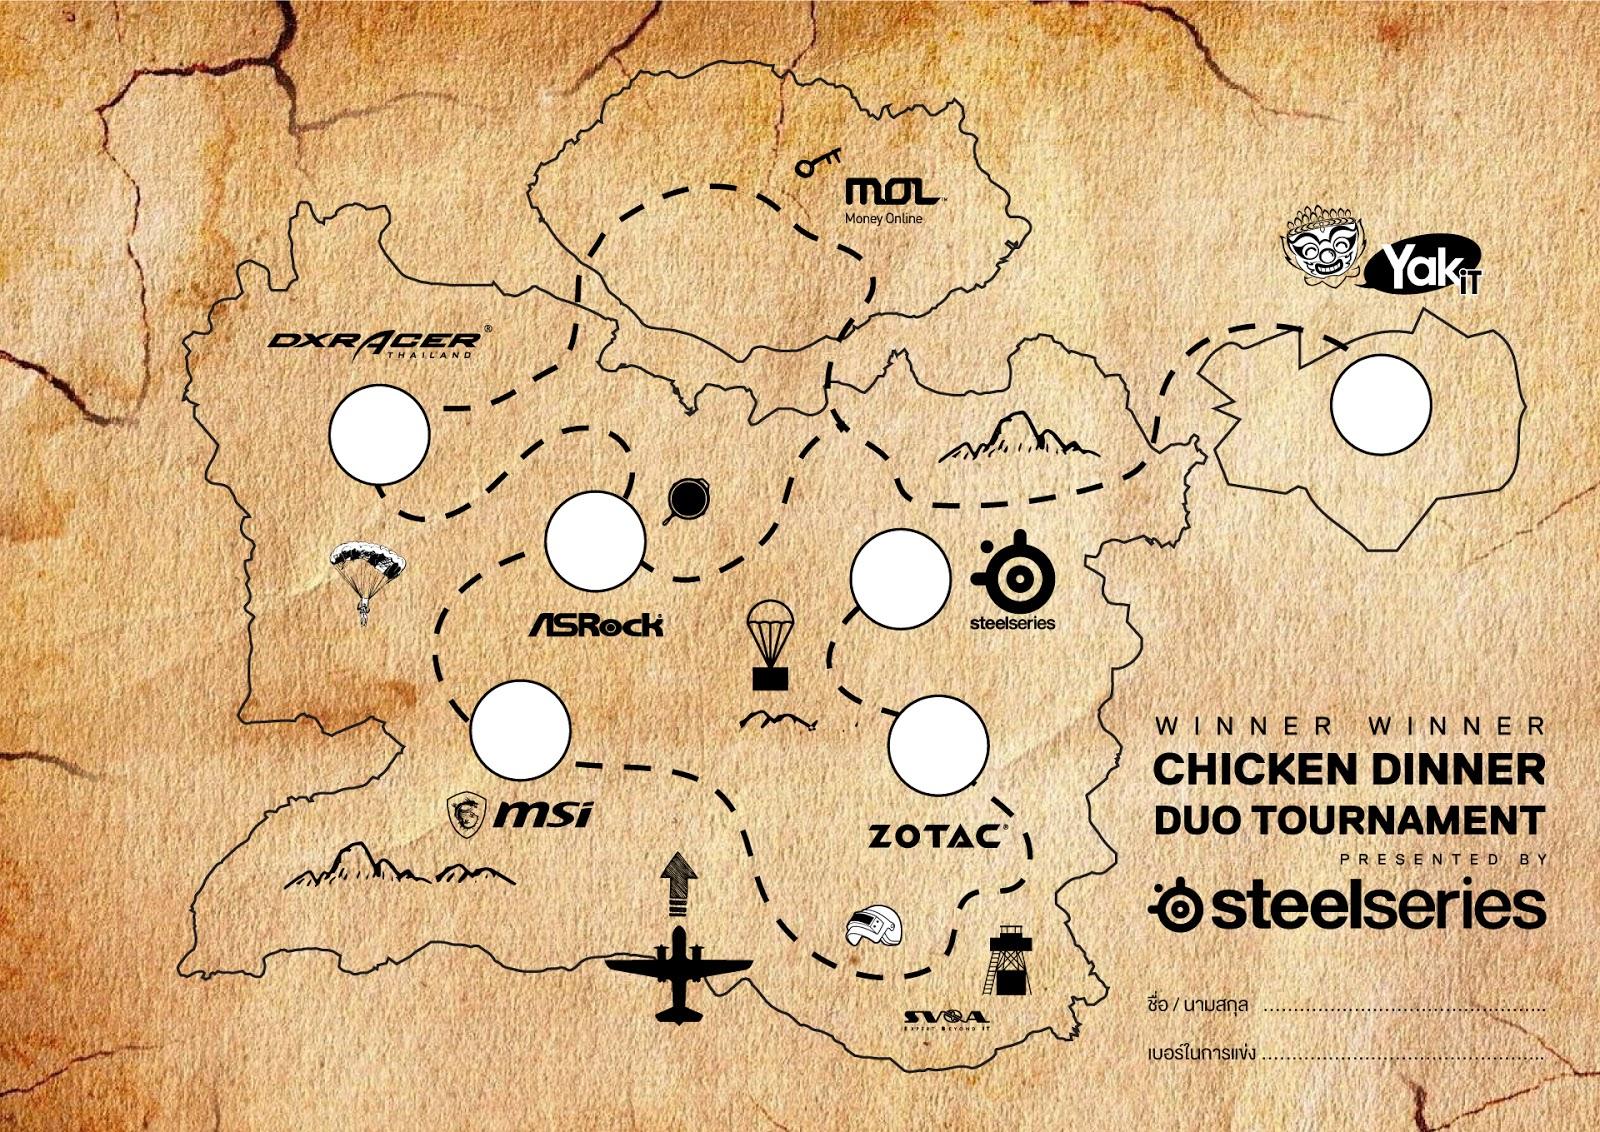 rc map Chicken Dinner Duo Tournament presented by SteelSeriesเกมเมอร์ชาวหาดใหญ่ เจอกัน 26 พค. 2561 นี้